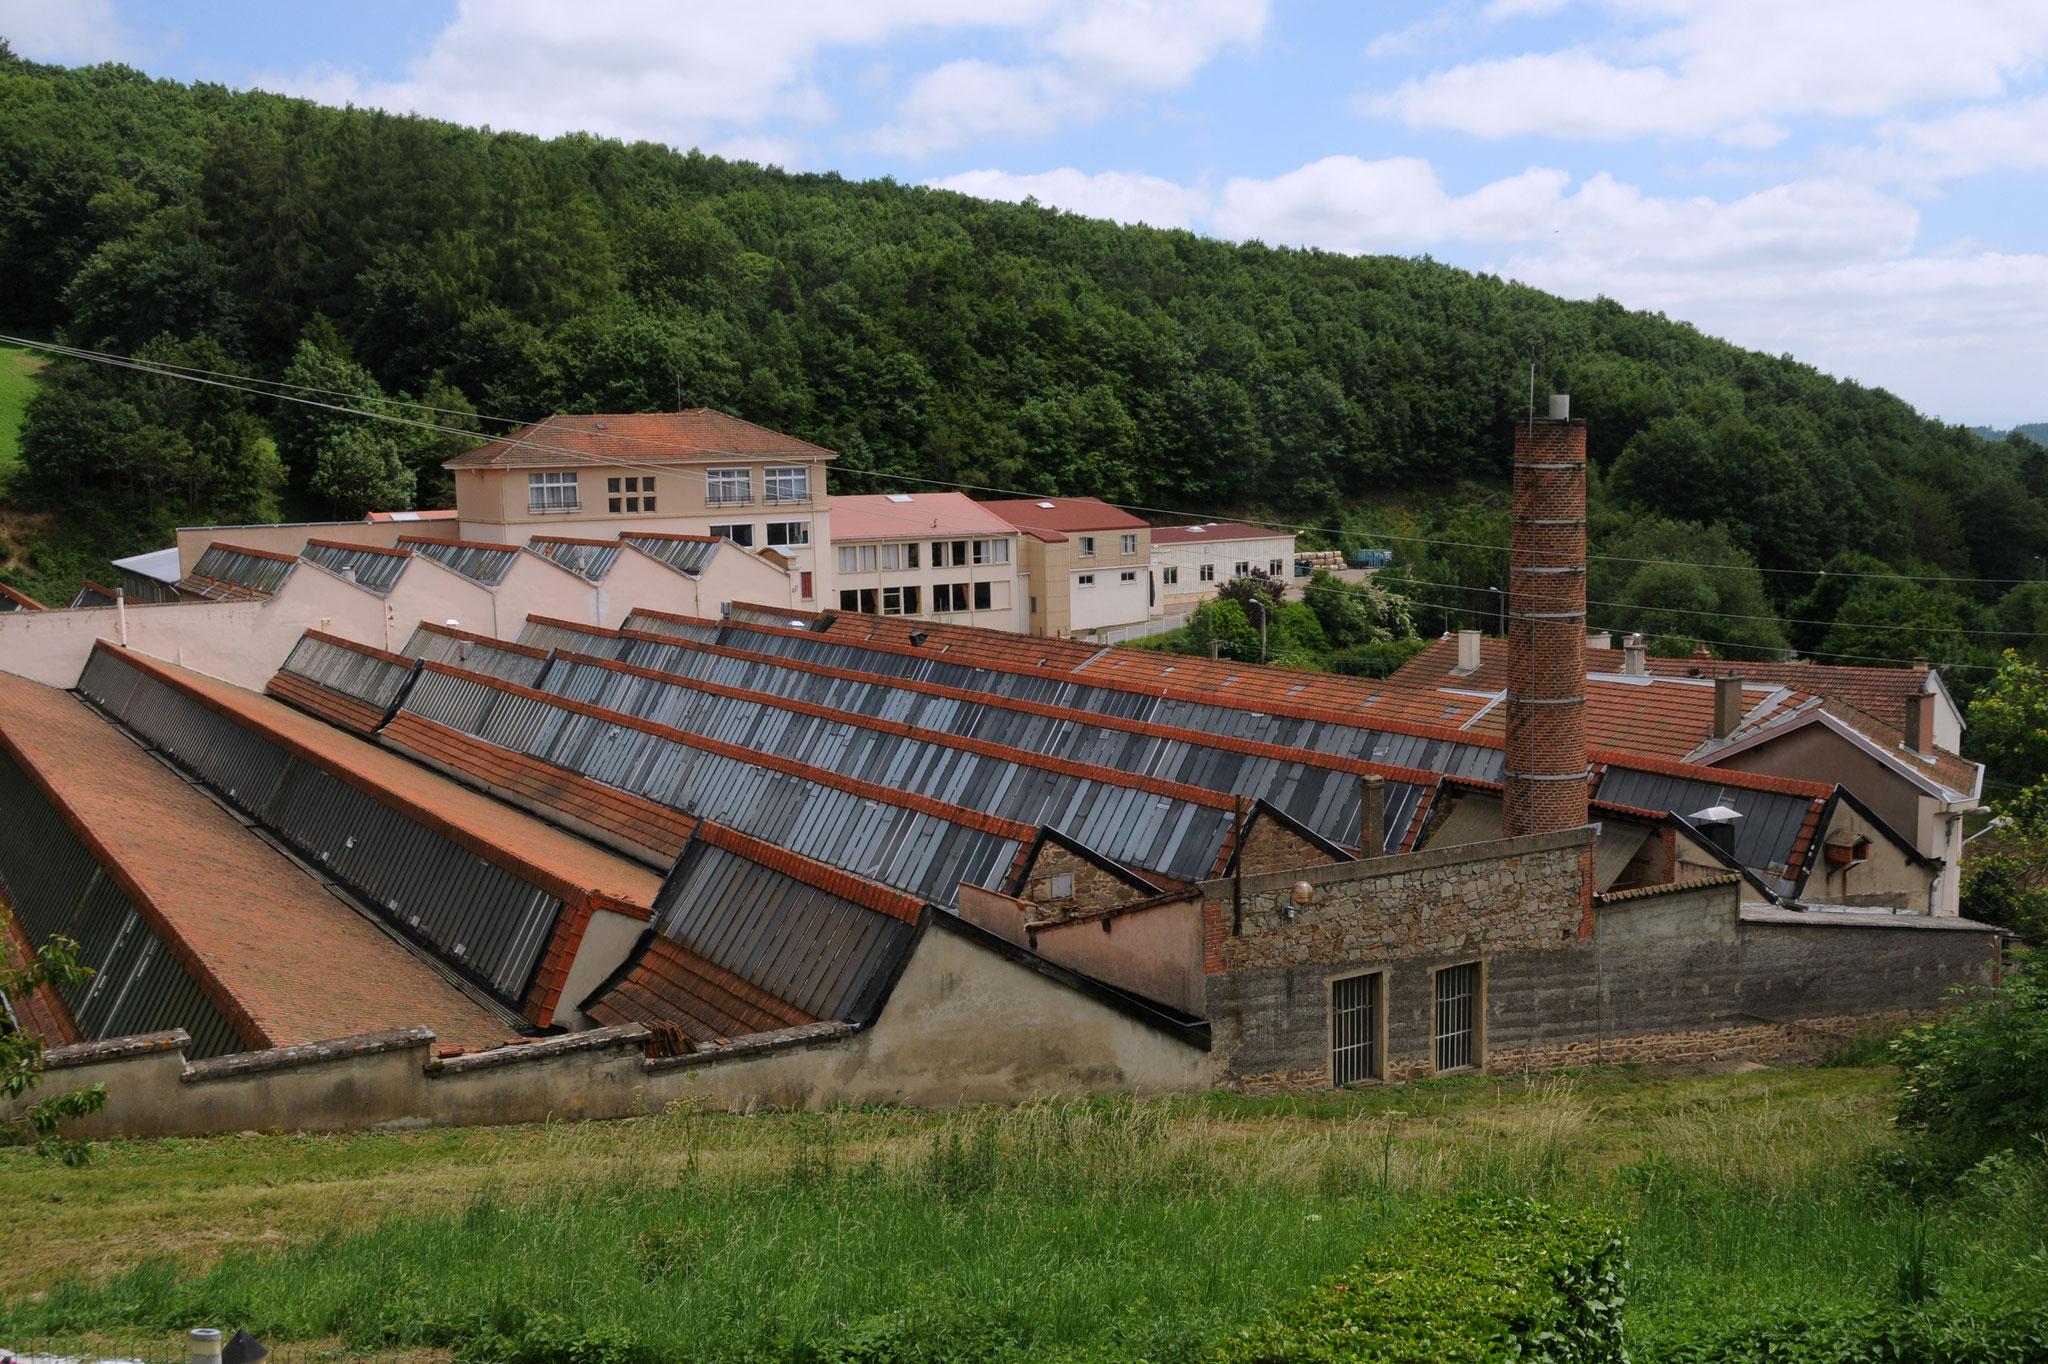 Sheds de l'usine Linder à Violay